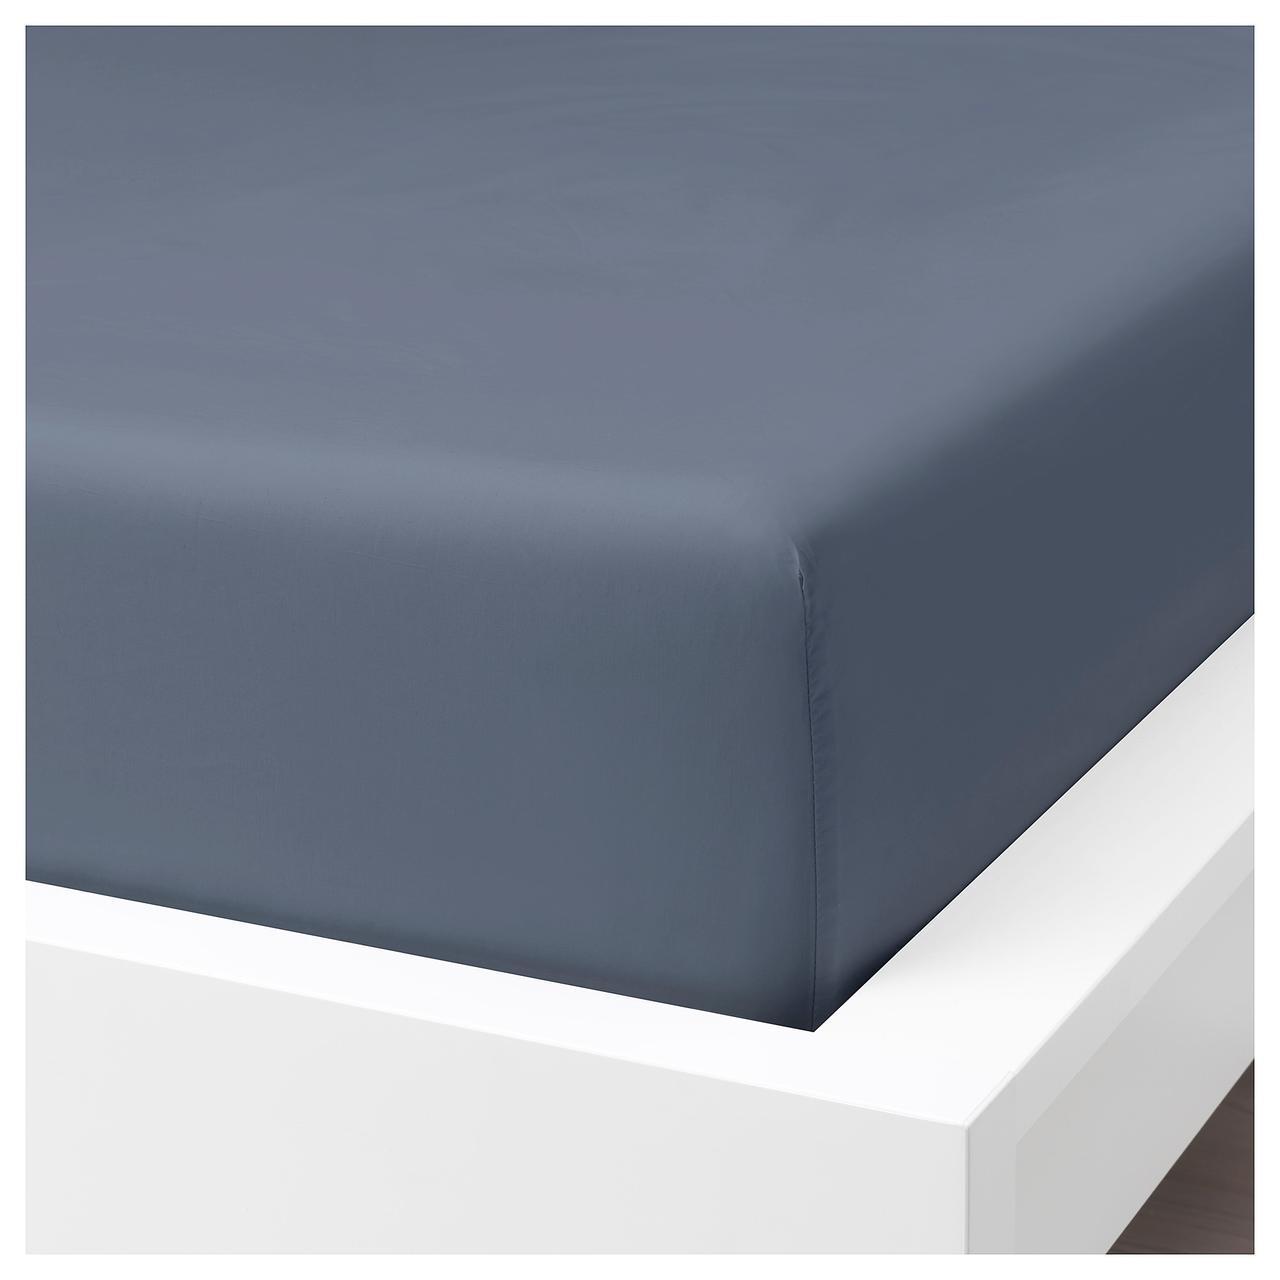 Простыня IKEA SÖMNTUTA 140х200 см на резинке темно-синяя 304.127.59